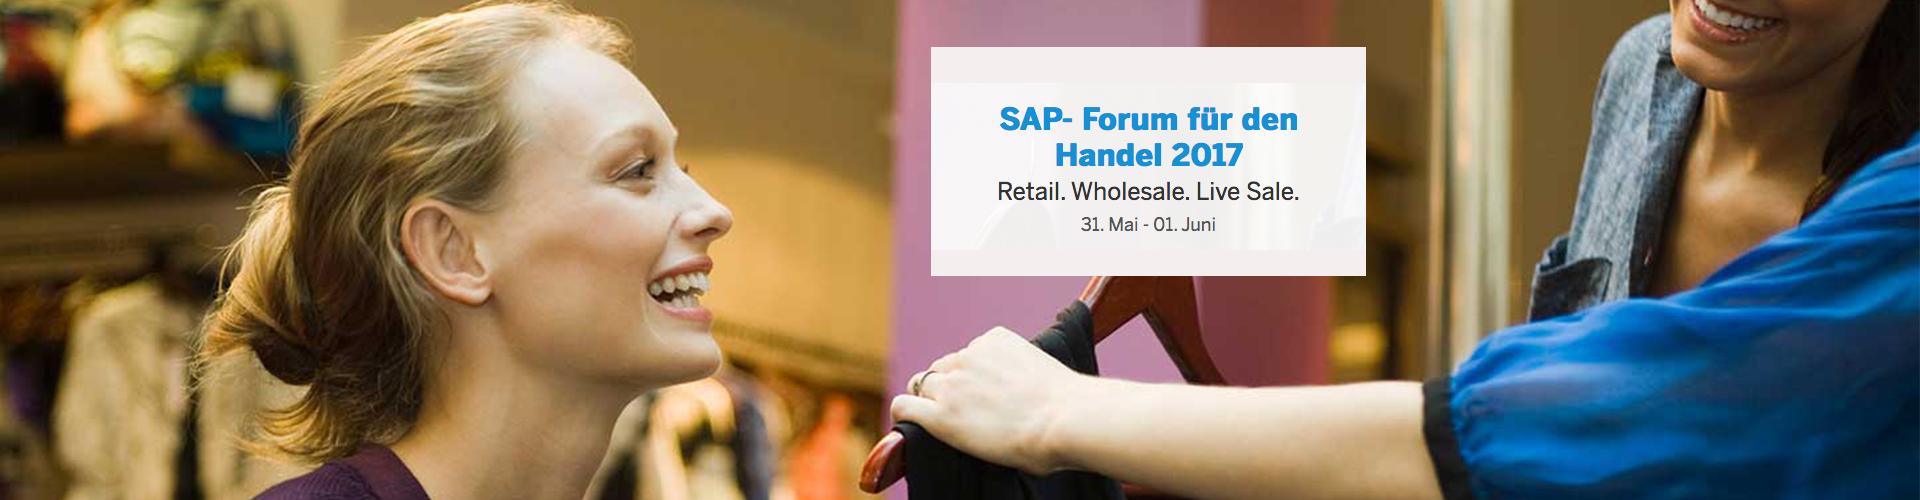 SAP Forum Handel